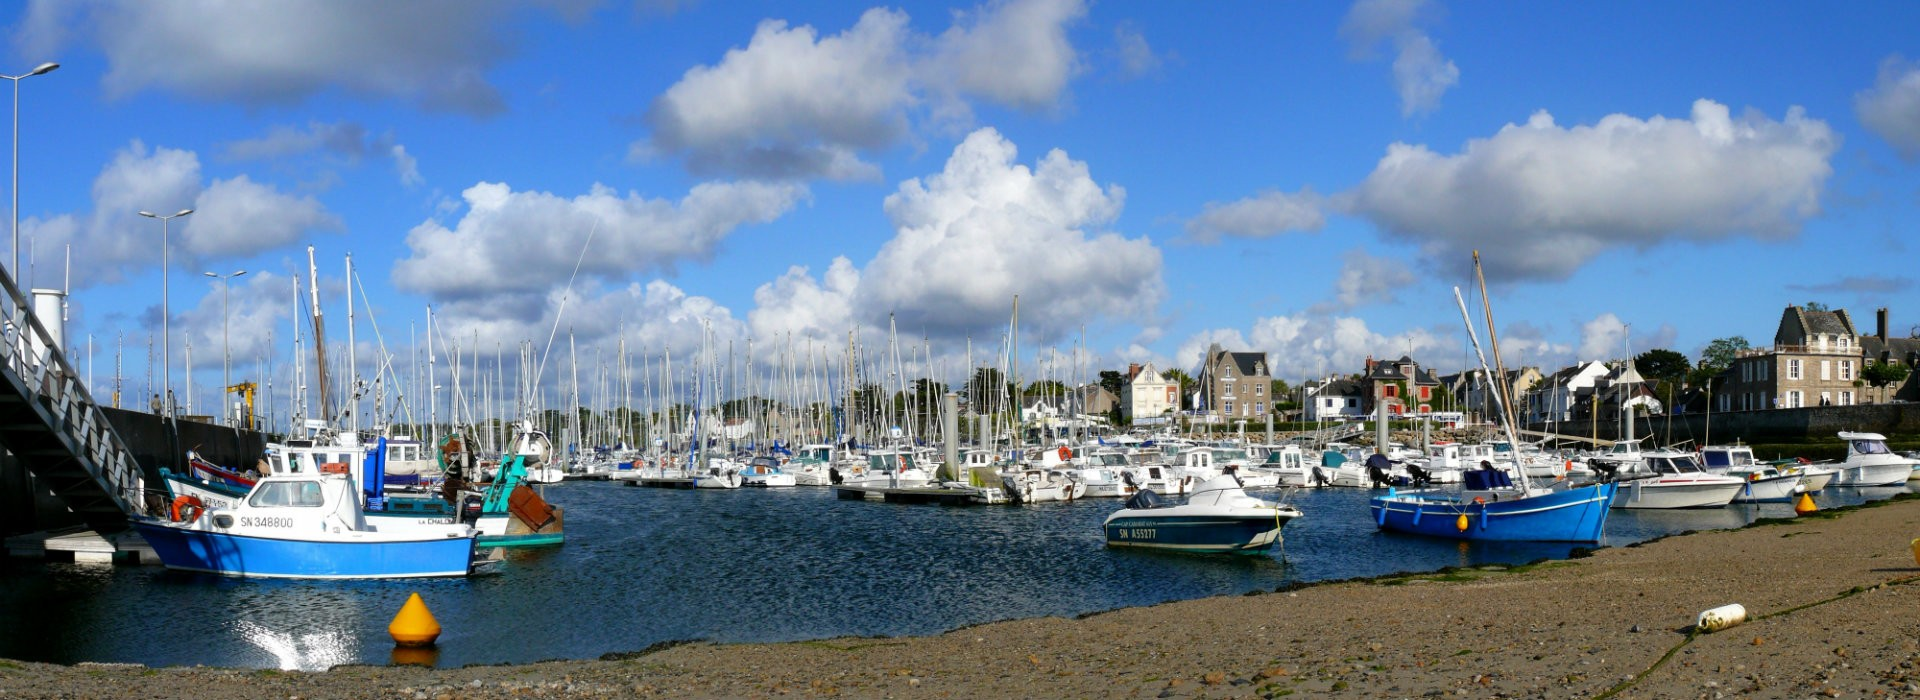 Port de Piriac-sur-Mer - Bruno Schoch